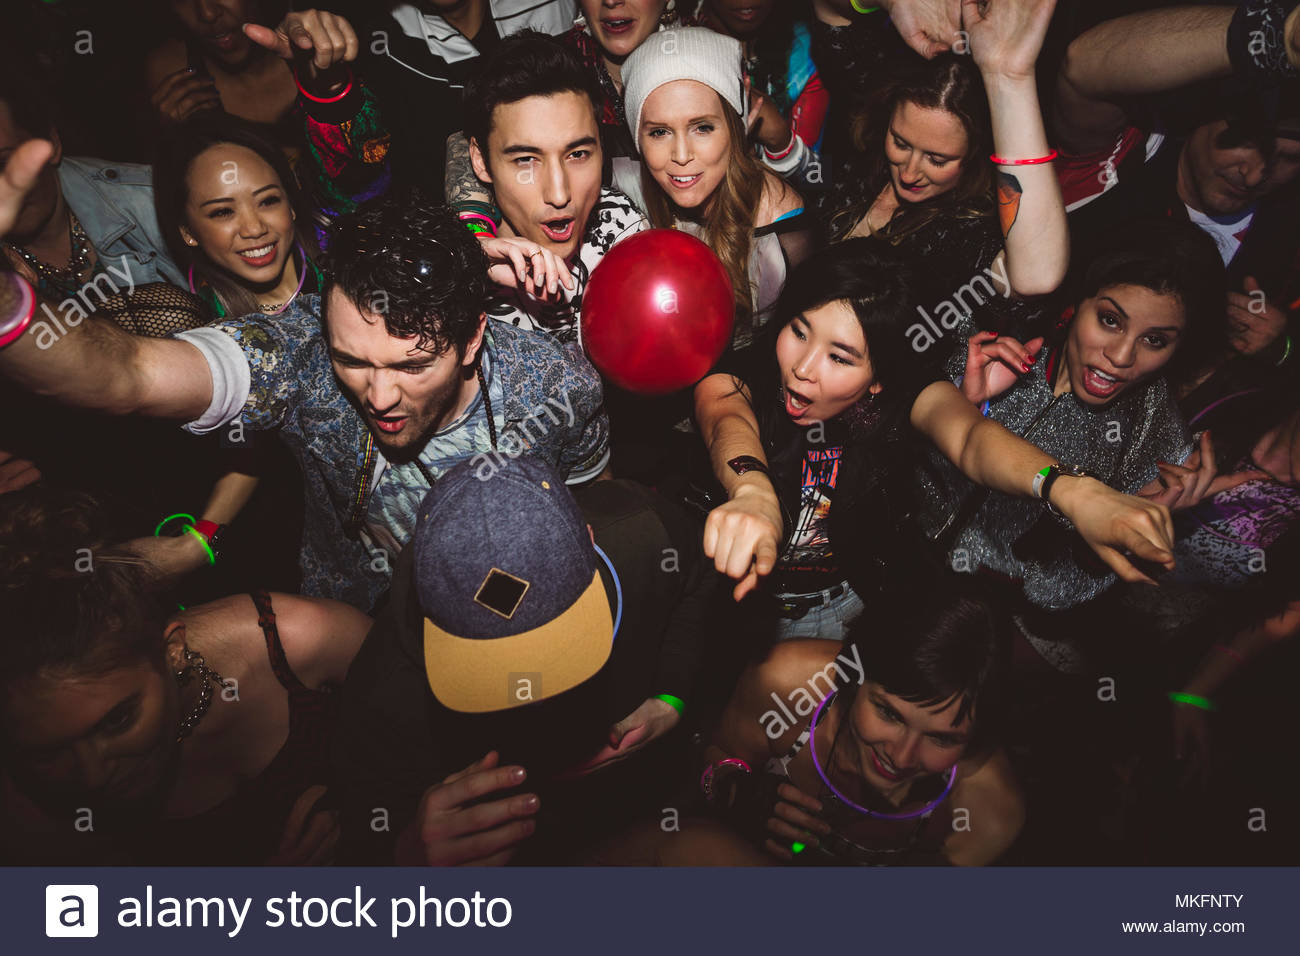 Sorglos milennials Tanzen, Feiern in der Diskothek Stockbild